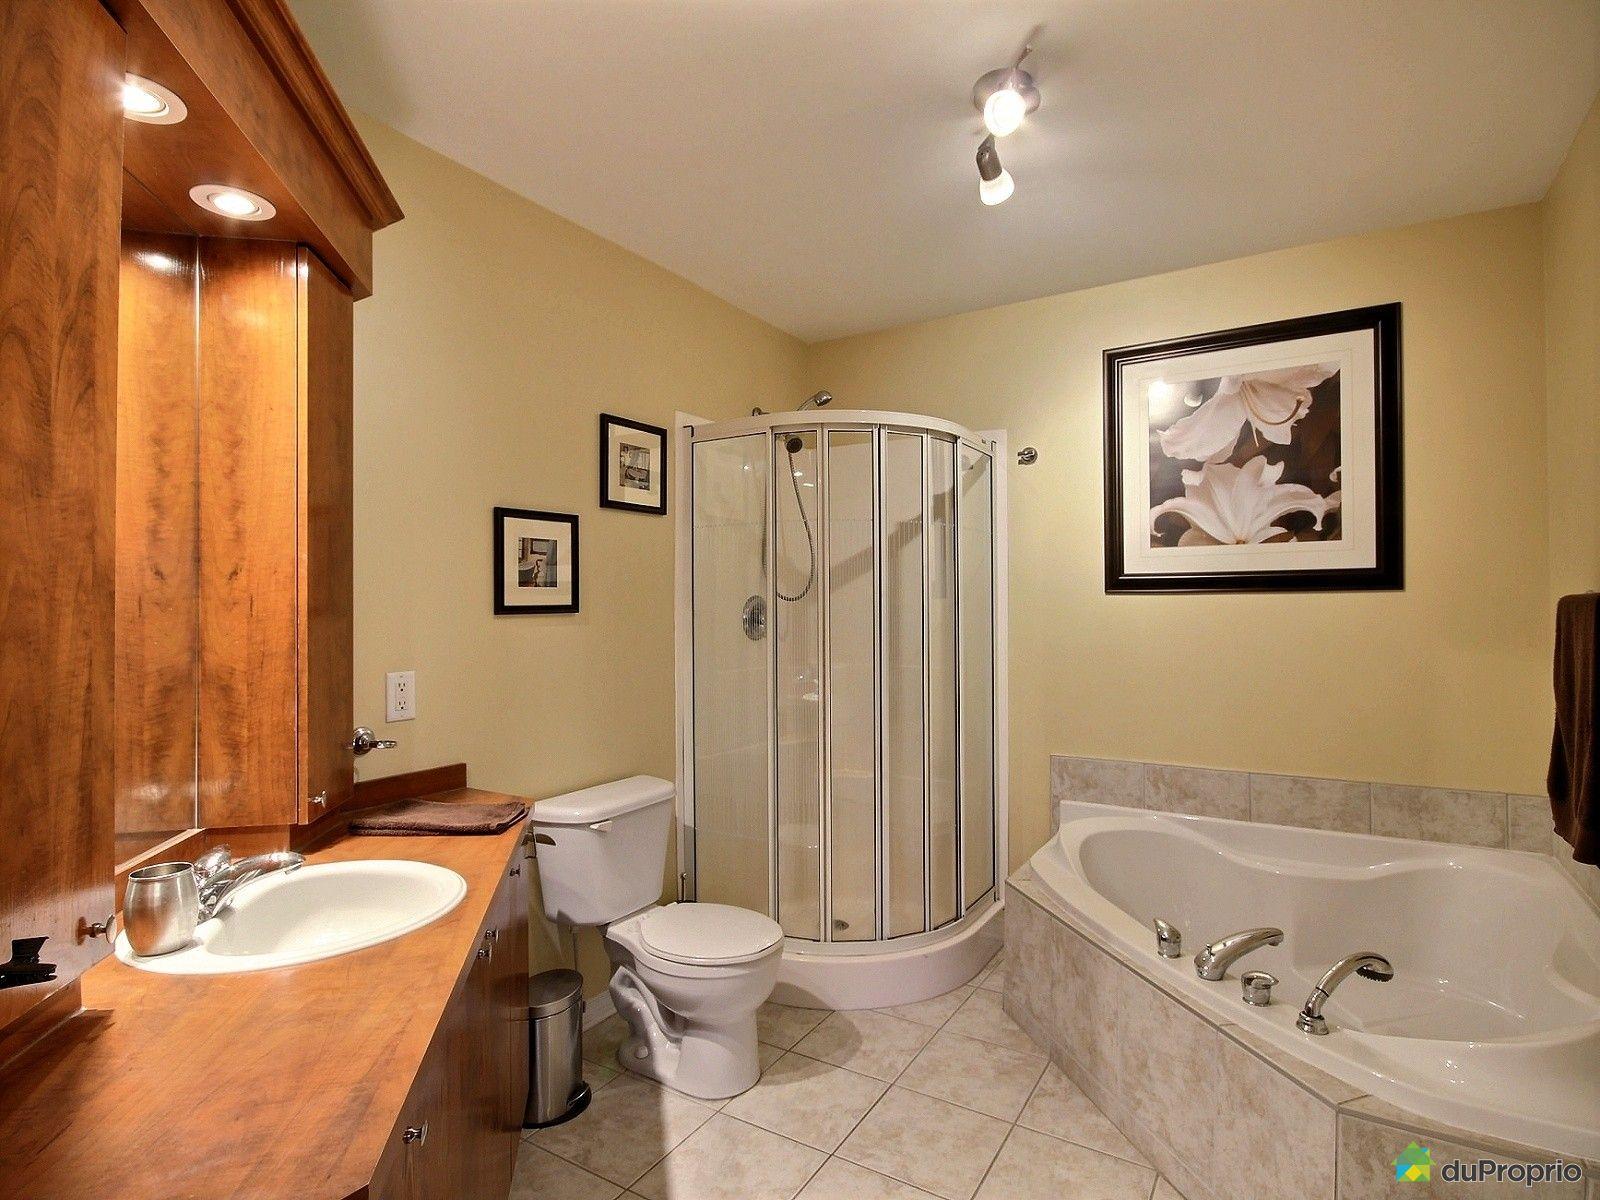 Condo vendre st eustache 5 146 rue ric immobilier for Salle de bain 25 st eustache